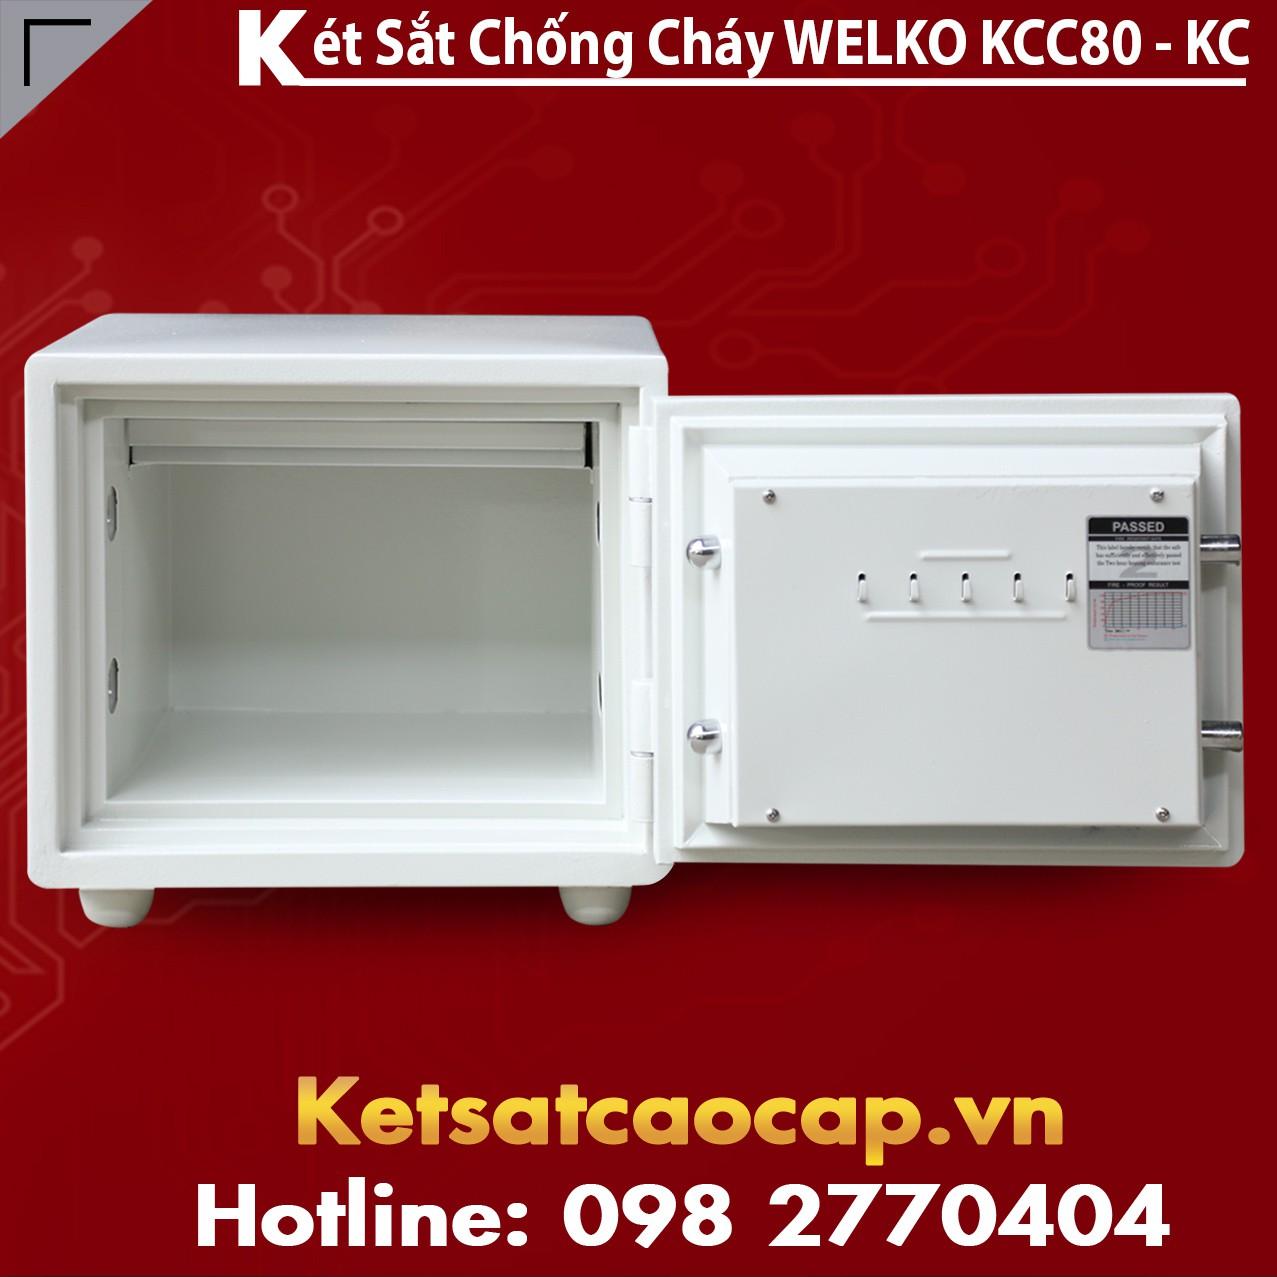 Mua Két Sắt KCC80 White - KC